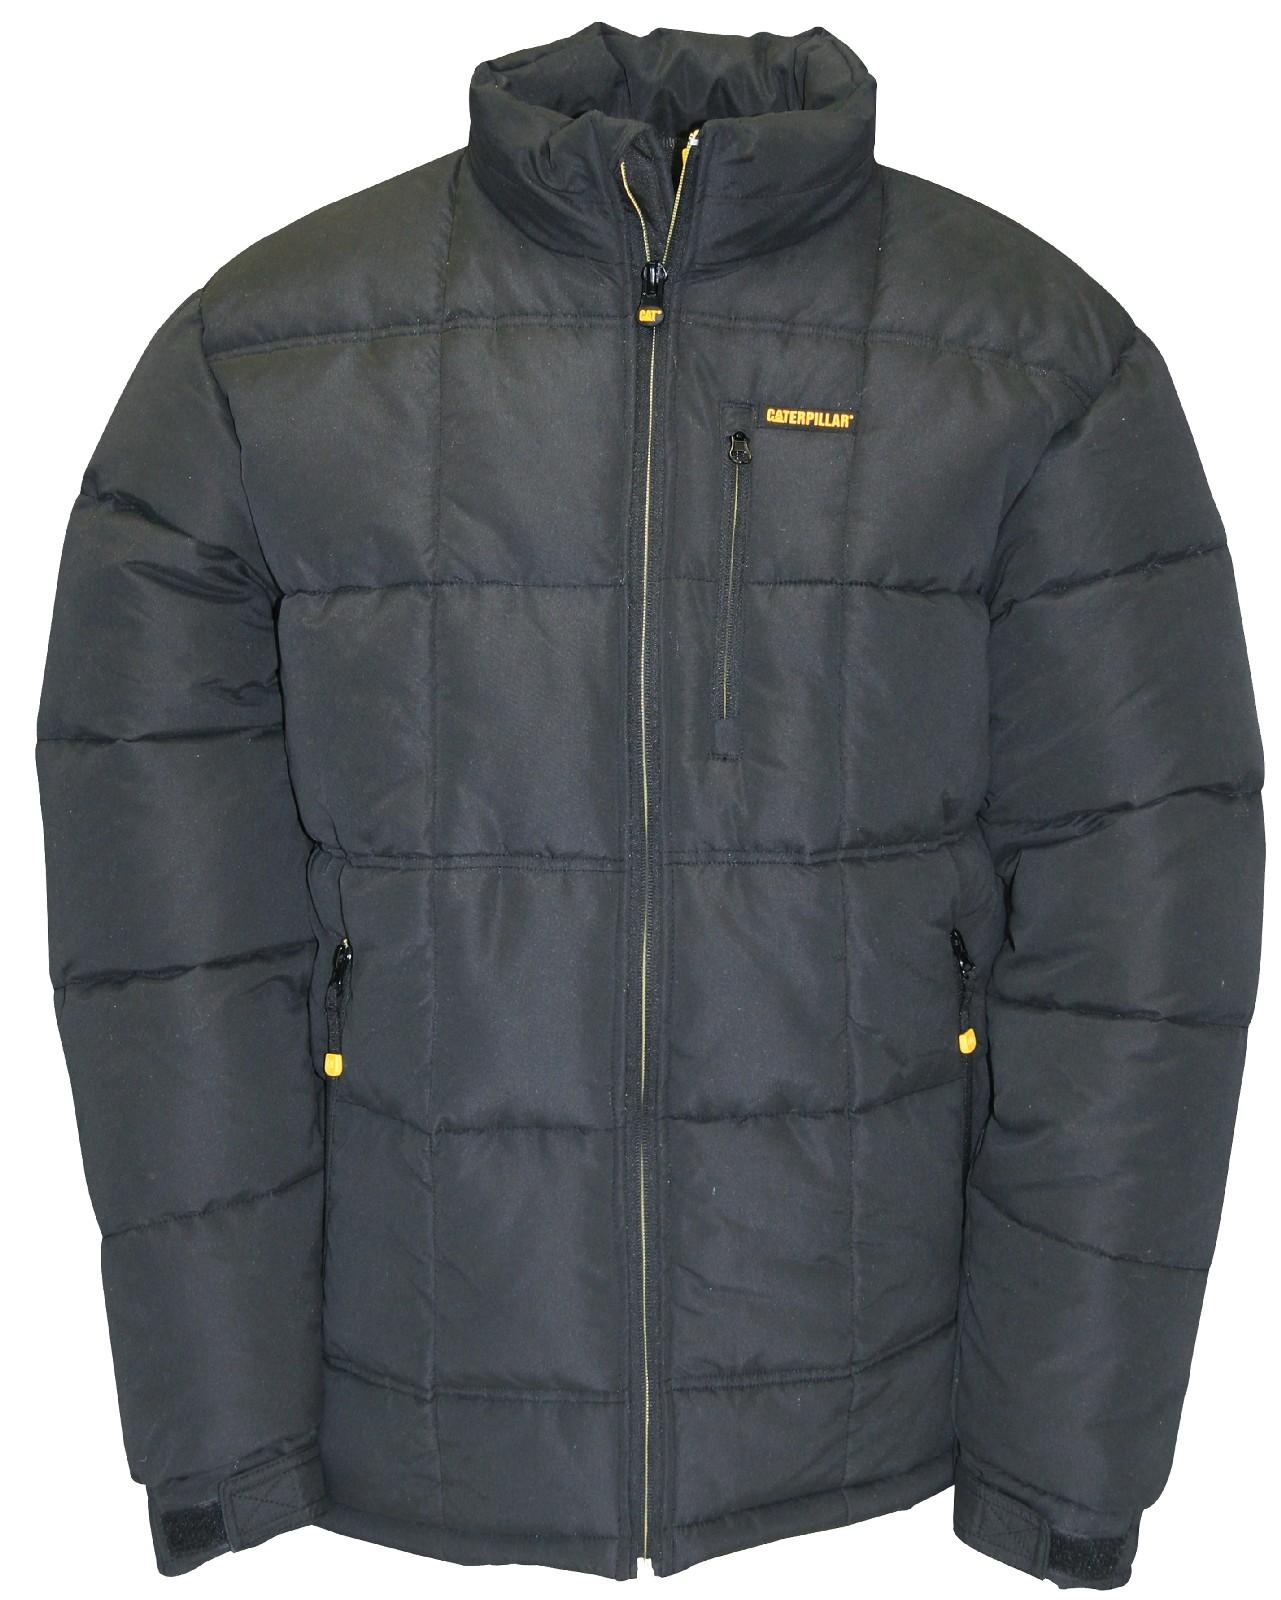 Caterpillar C1313069 Arctic Zone Jacket Black